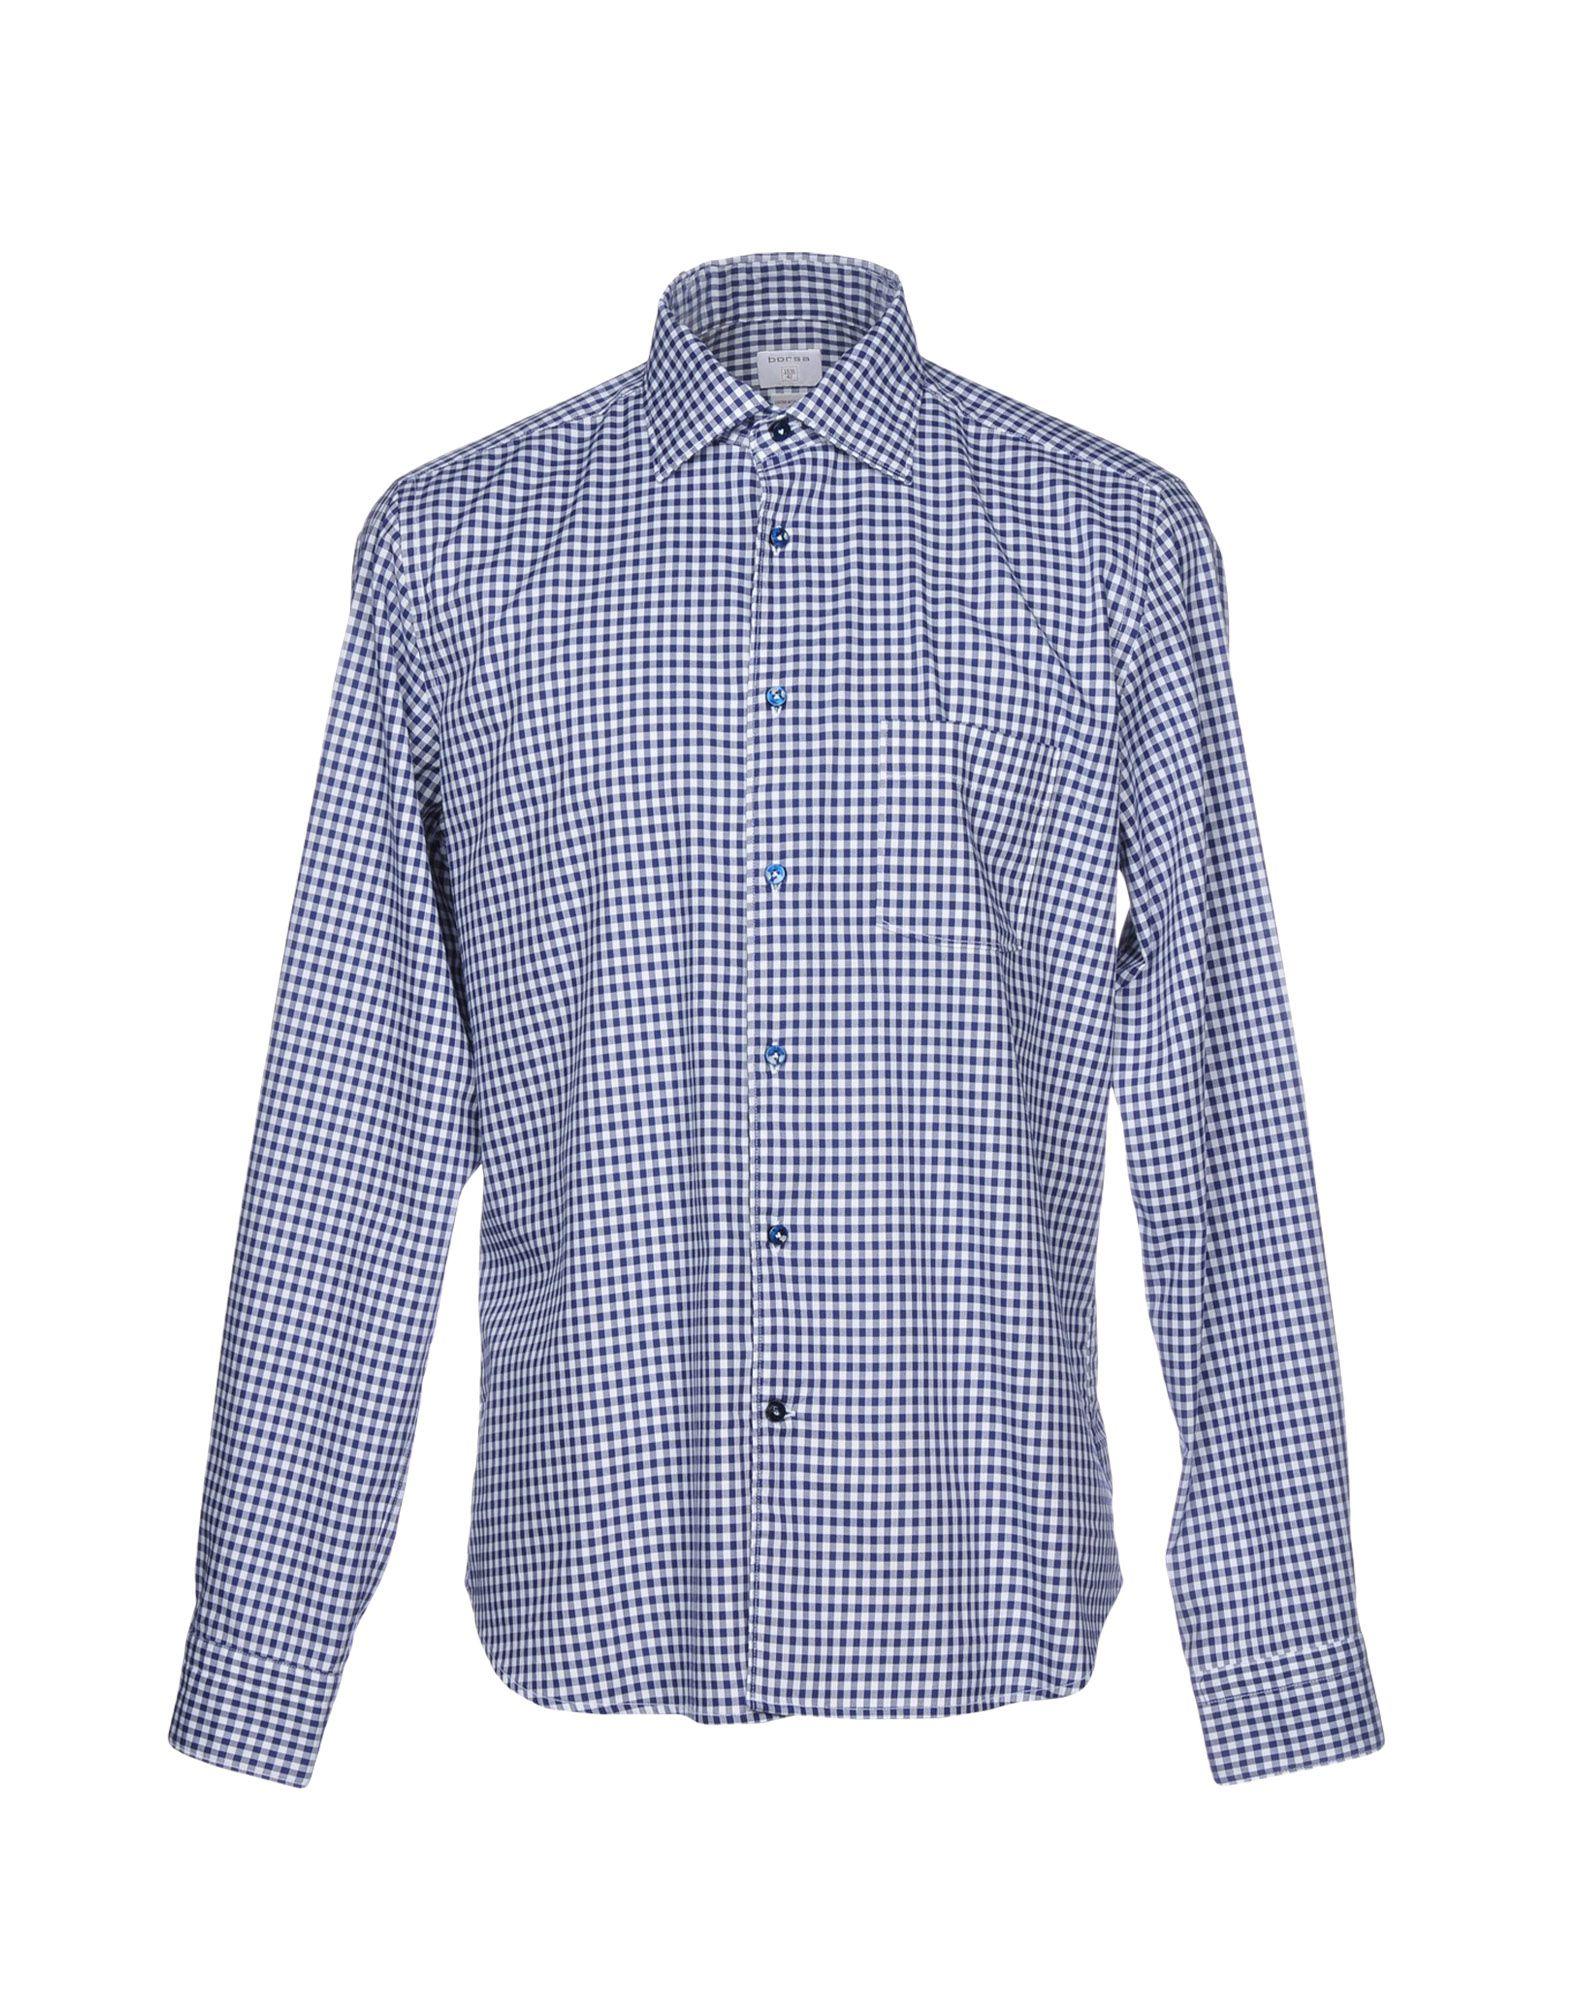 BORSA Checked Shirt in Blue